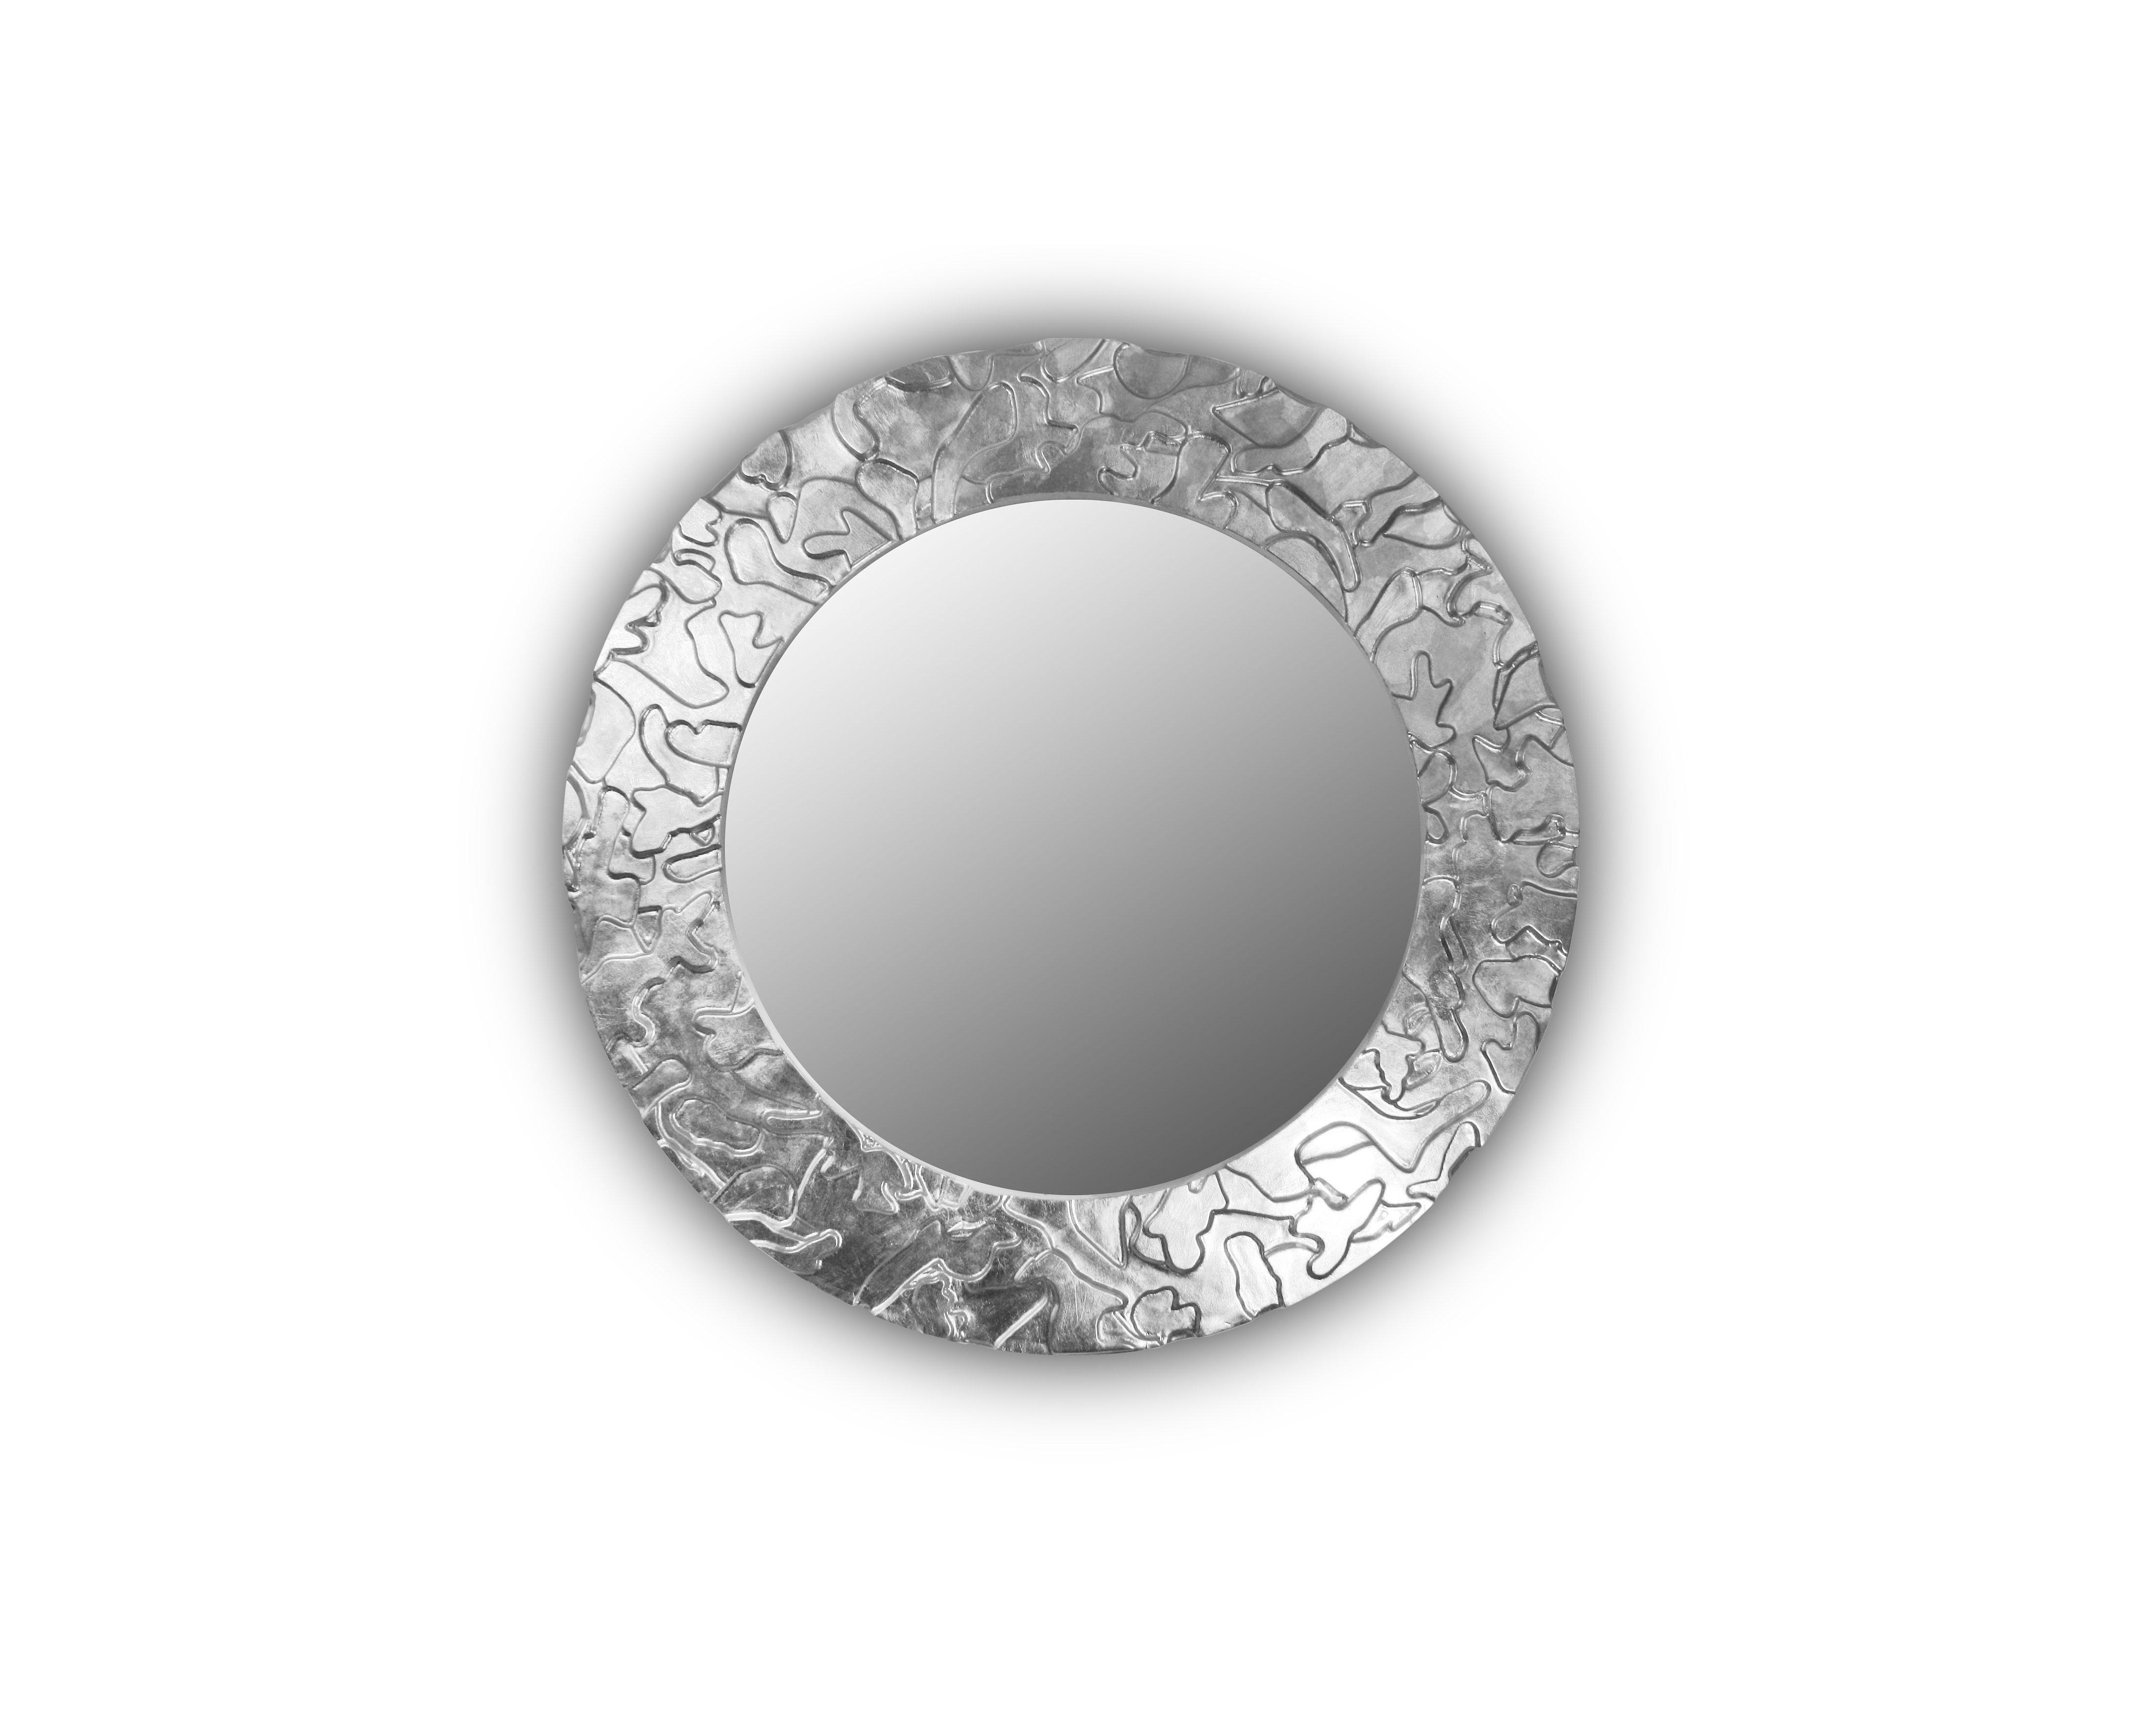 Зеркало CamouflageНастенные зеркала<br><br><br>Material: Дерево<br>Depth см: 3.6<br>Height см: None<br>Diameter см: 90